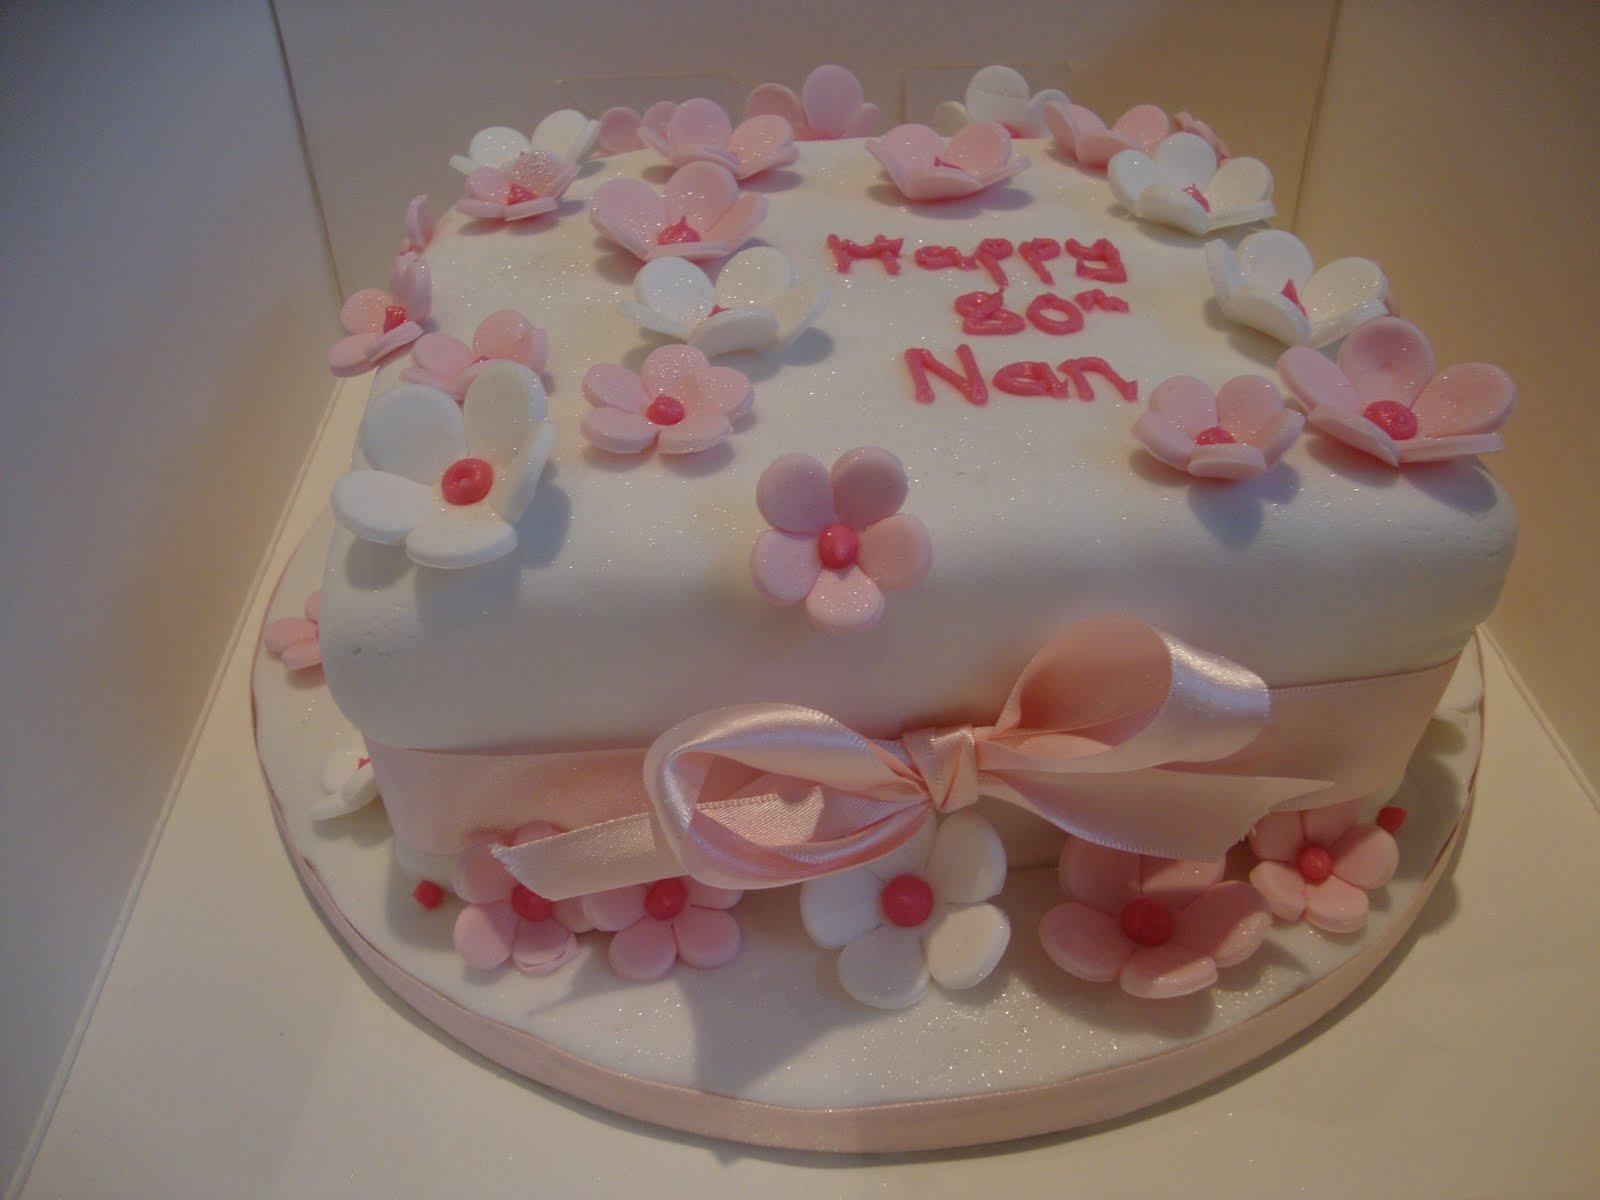 Mrs Gs Cakes Nans 80th Birthday Cake